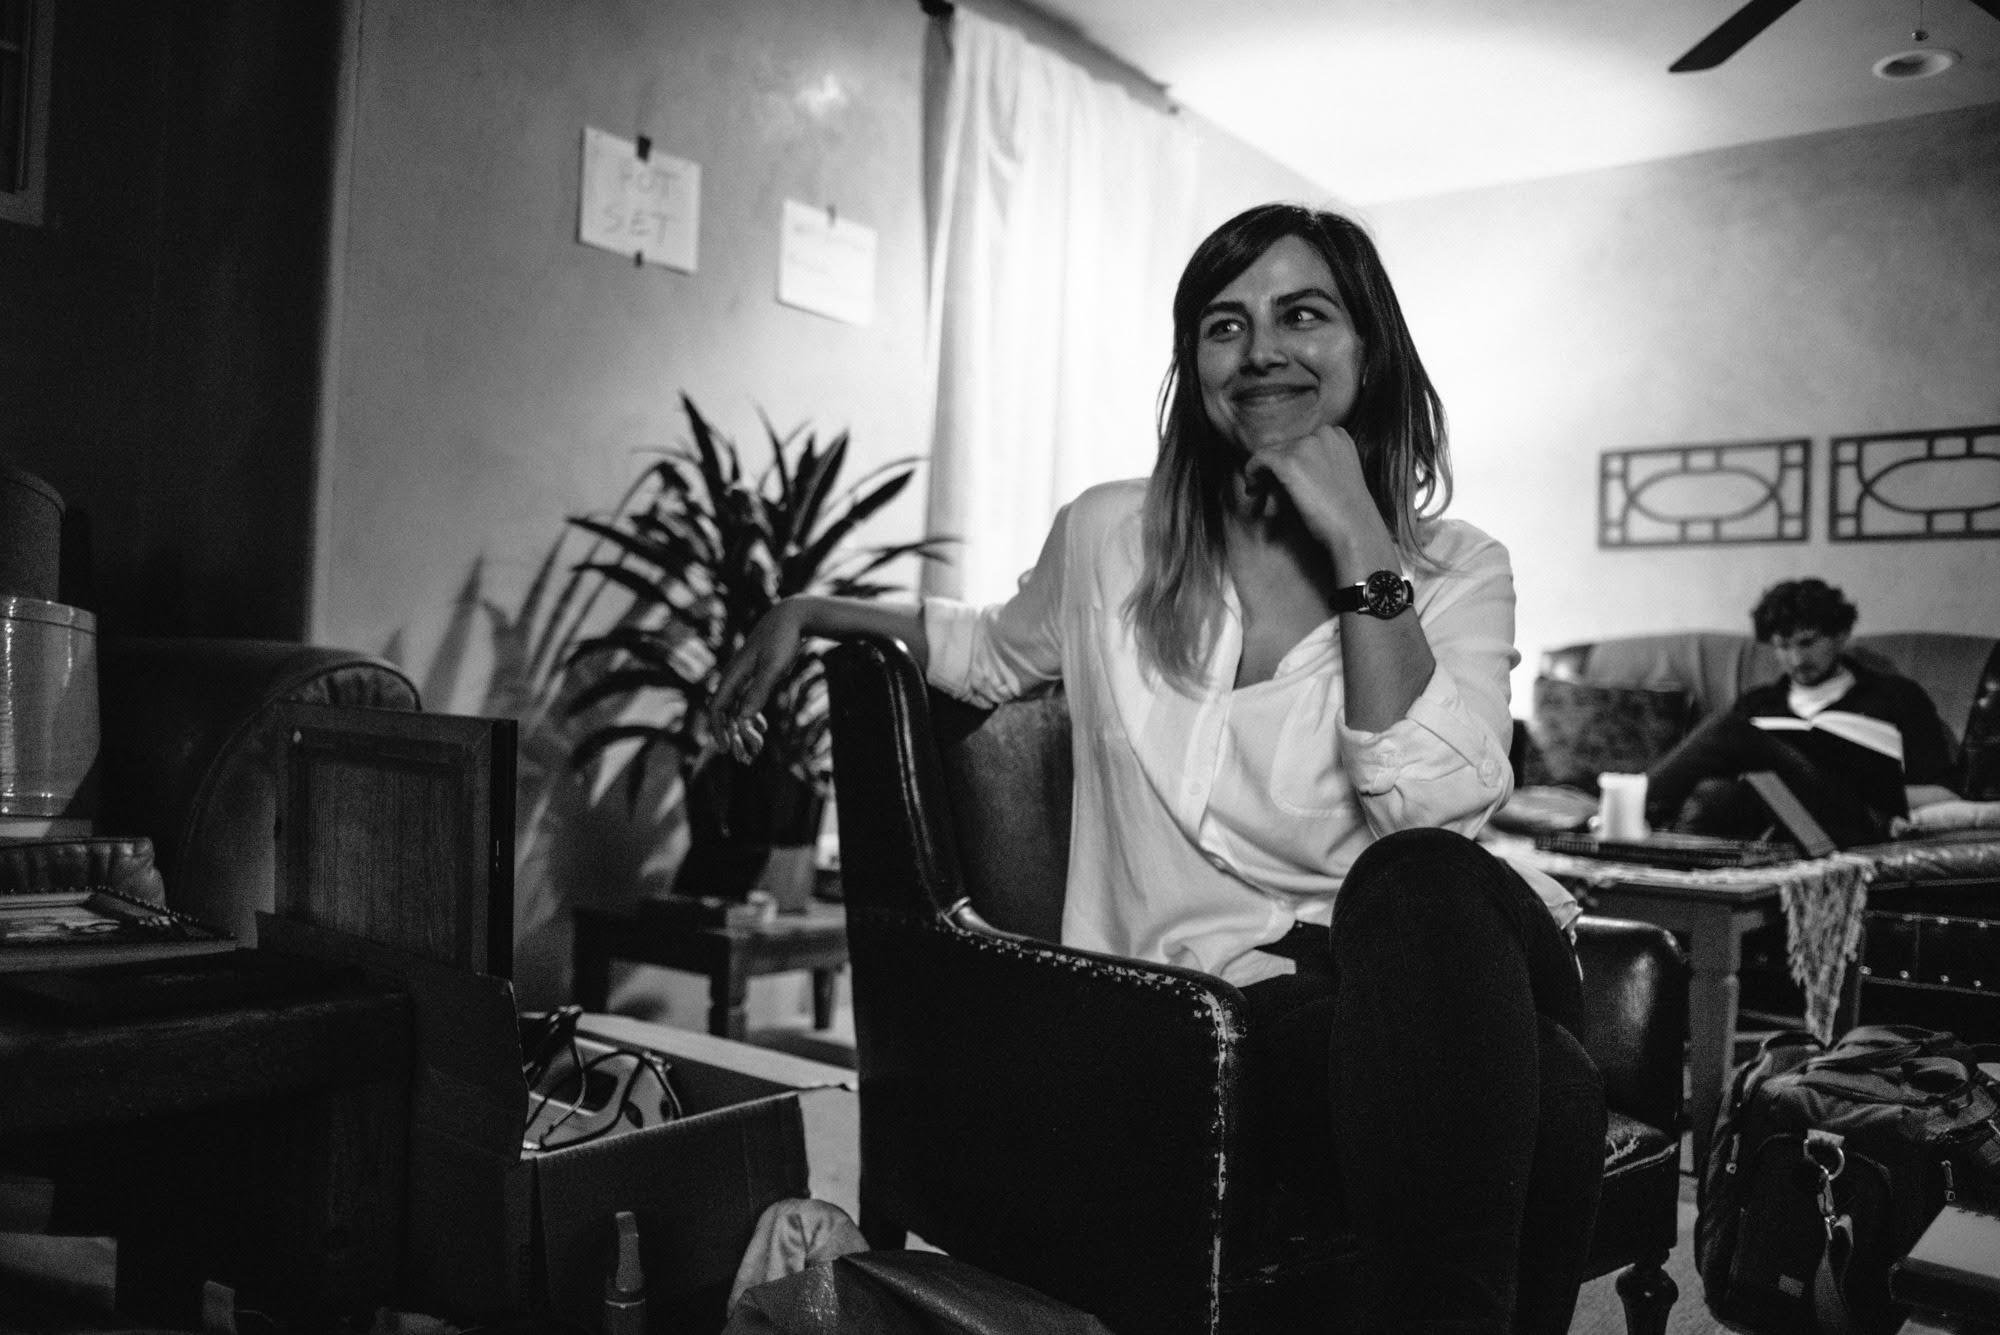 Natasha Kermani sitting and smiling at the set of Imitation Girl